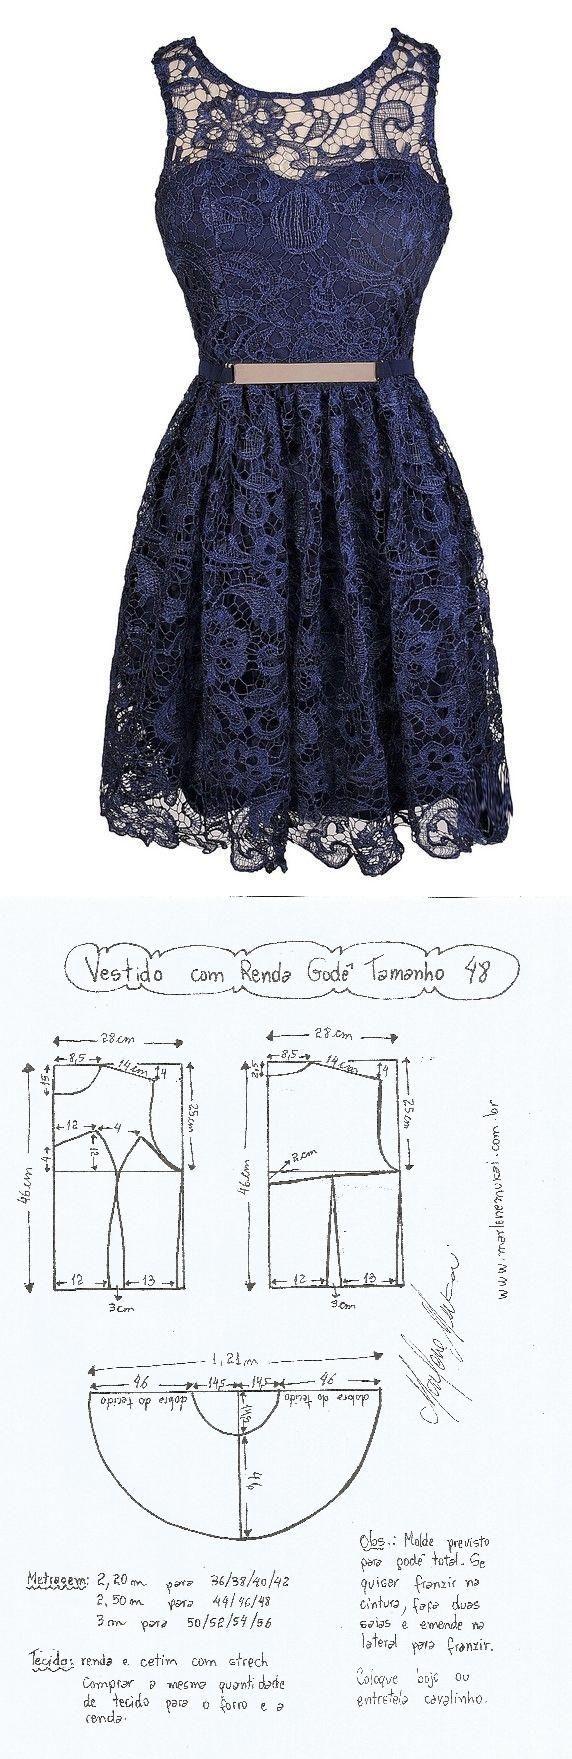 Vestido com Renda Godê | handcrafted | Pinterest | Sewing, Dress ...